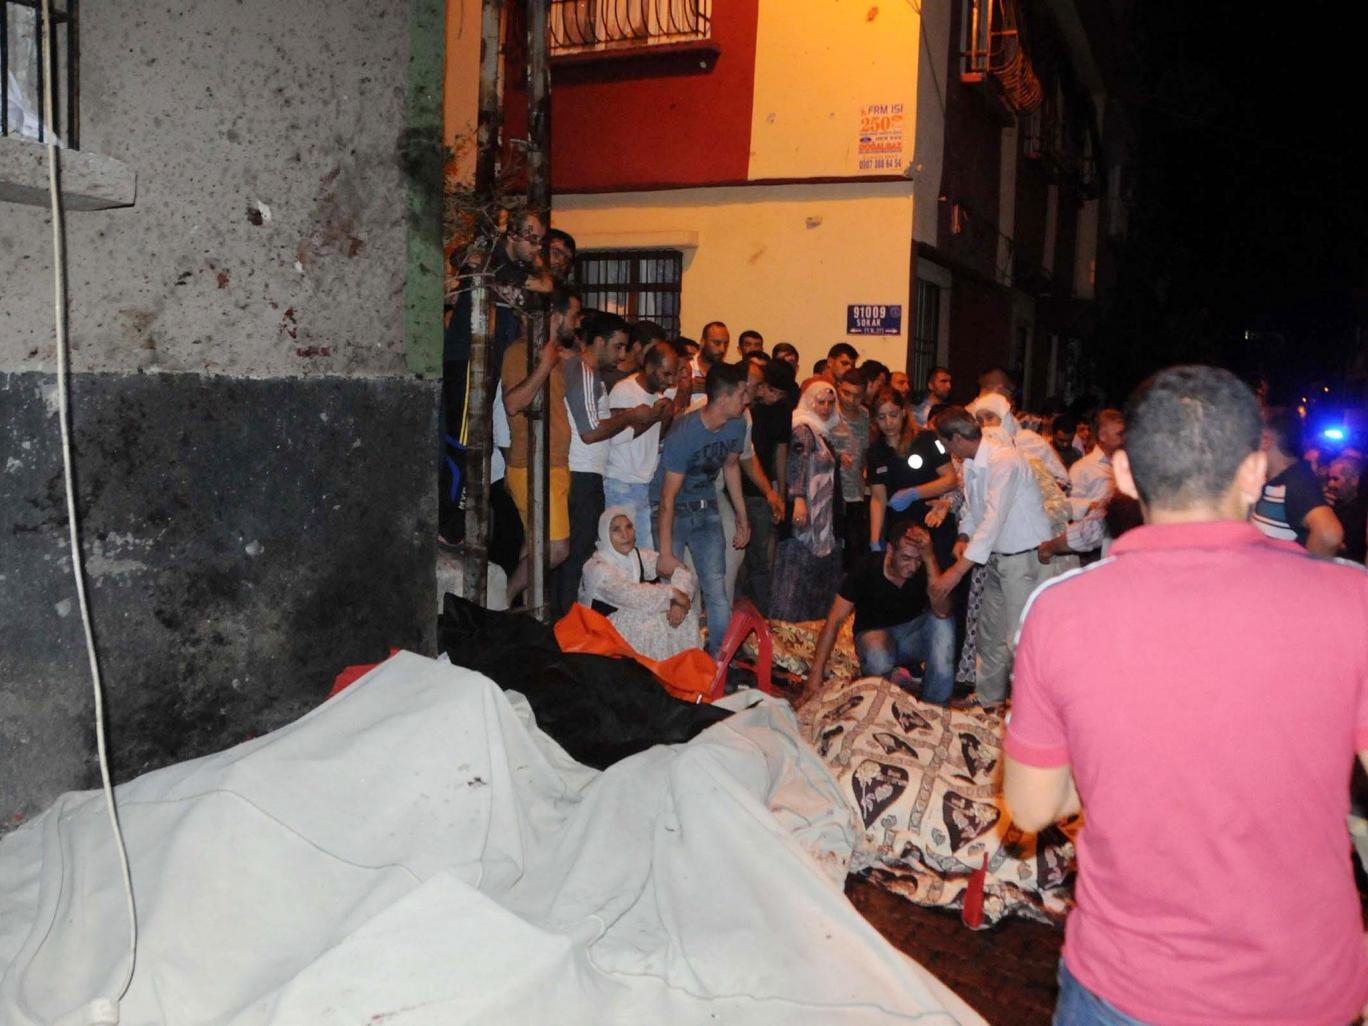 http://www.awwaaz.com/images/stories/                            Terror strikes Turkey, 51 dead,90 injured